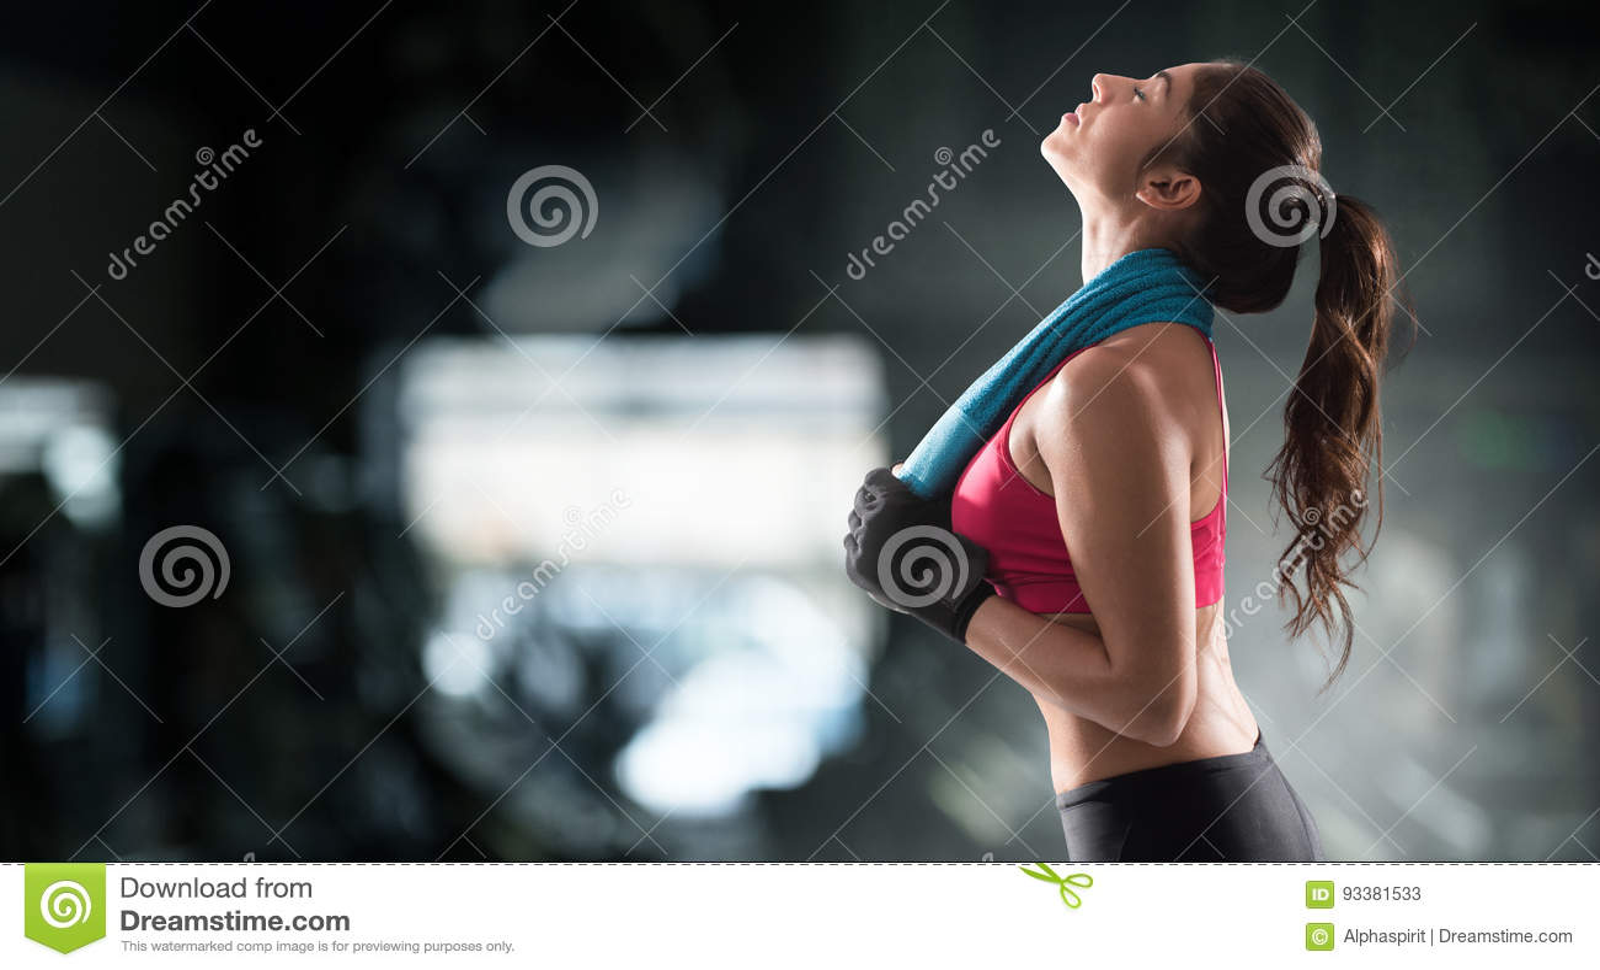 Kvinna efter idrottshallgenomkörare